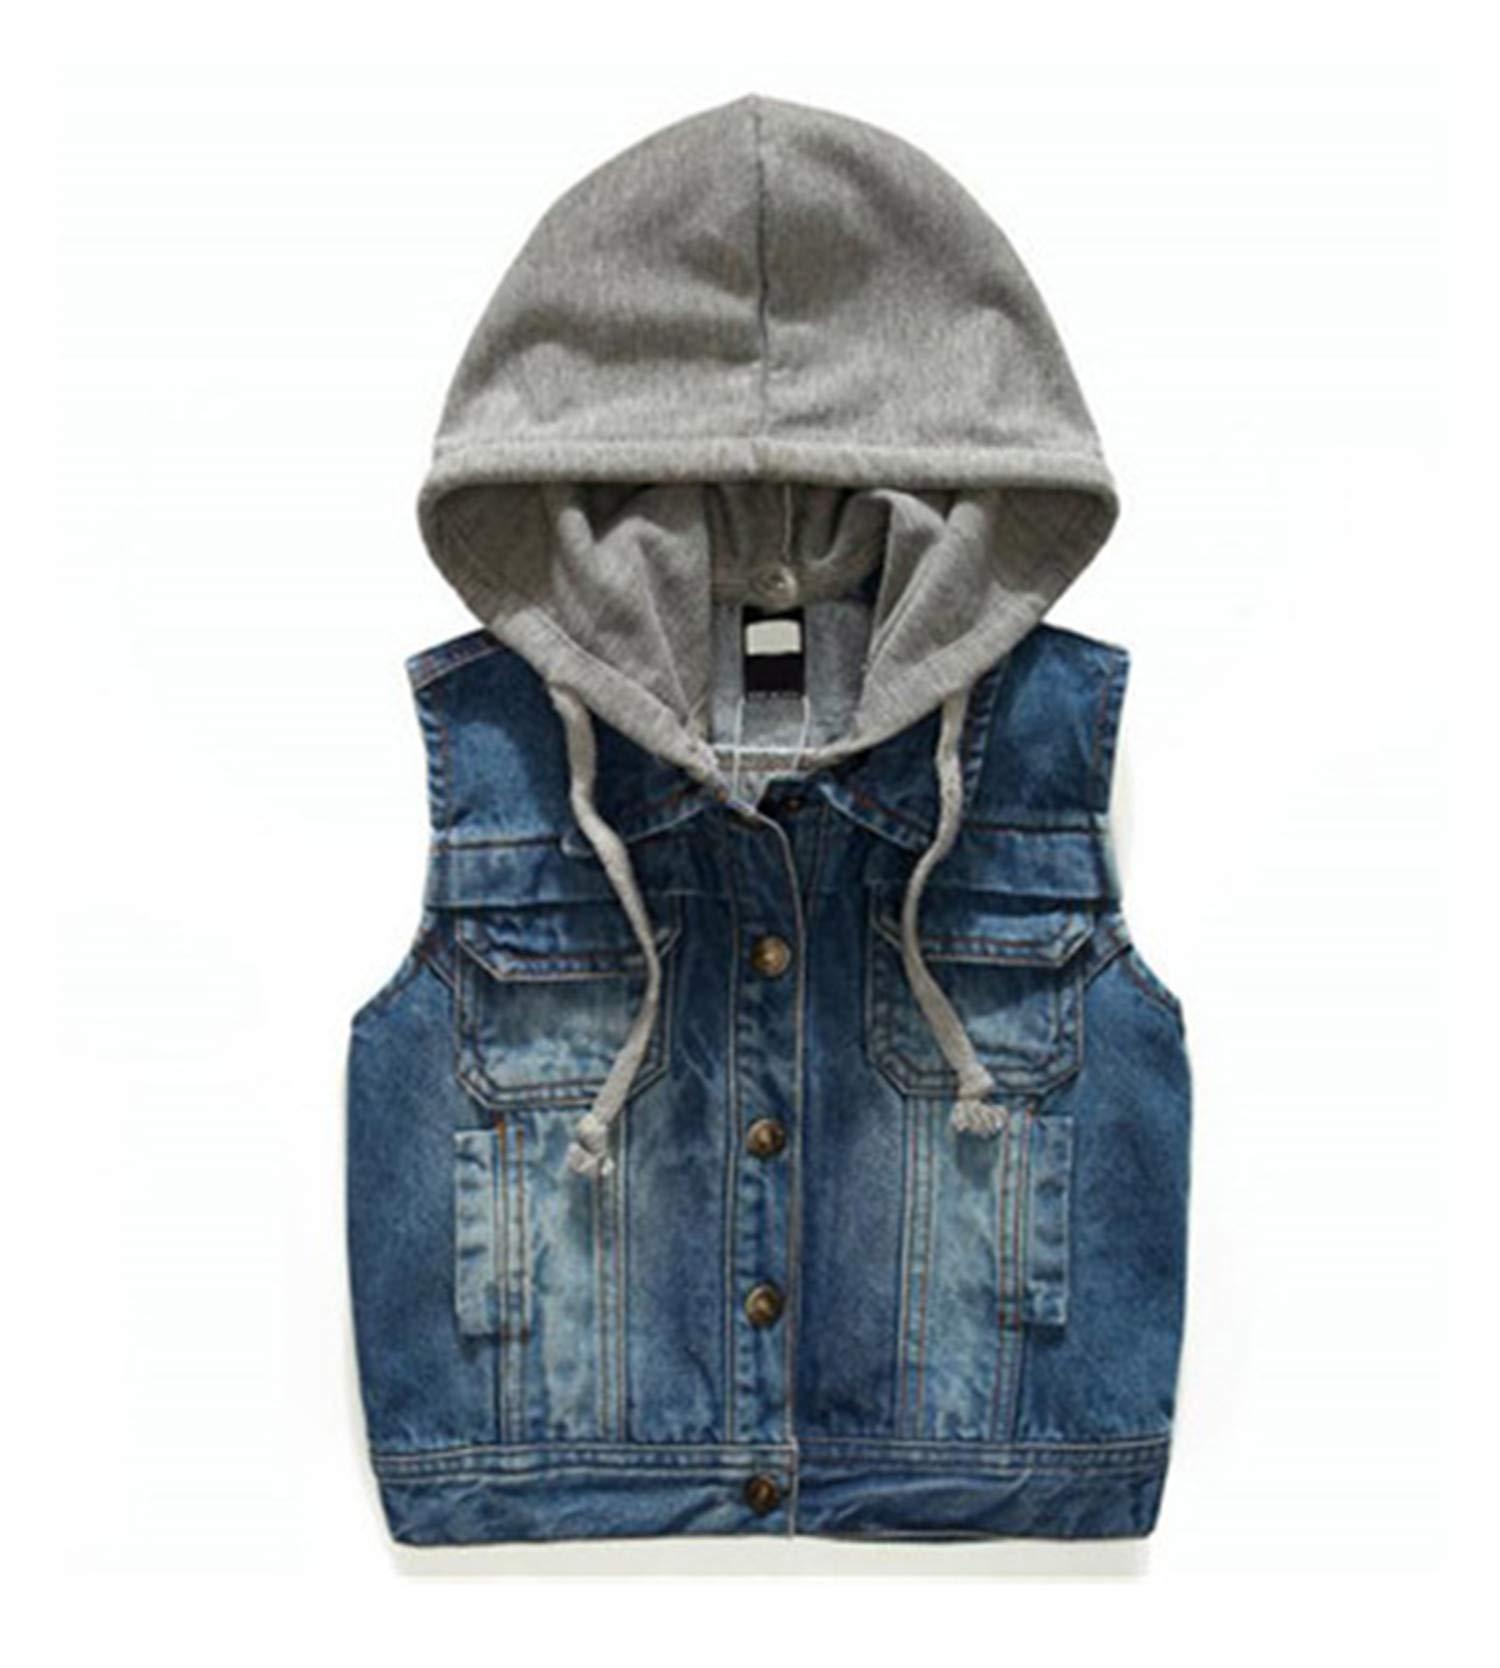 Gail Jonson Boys Vest Kids Waistcoat Children Jacket with Hood Top Cardigan Denim Outwear Blue 3T